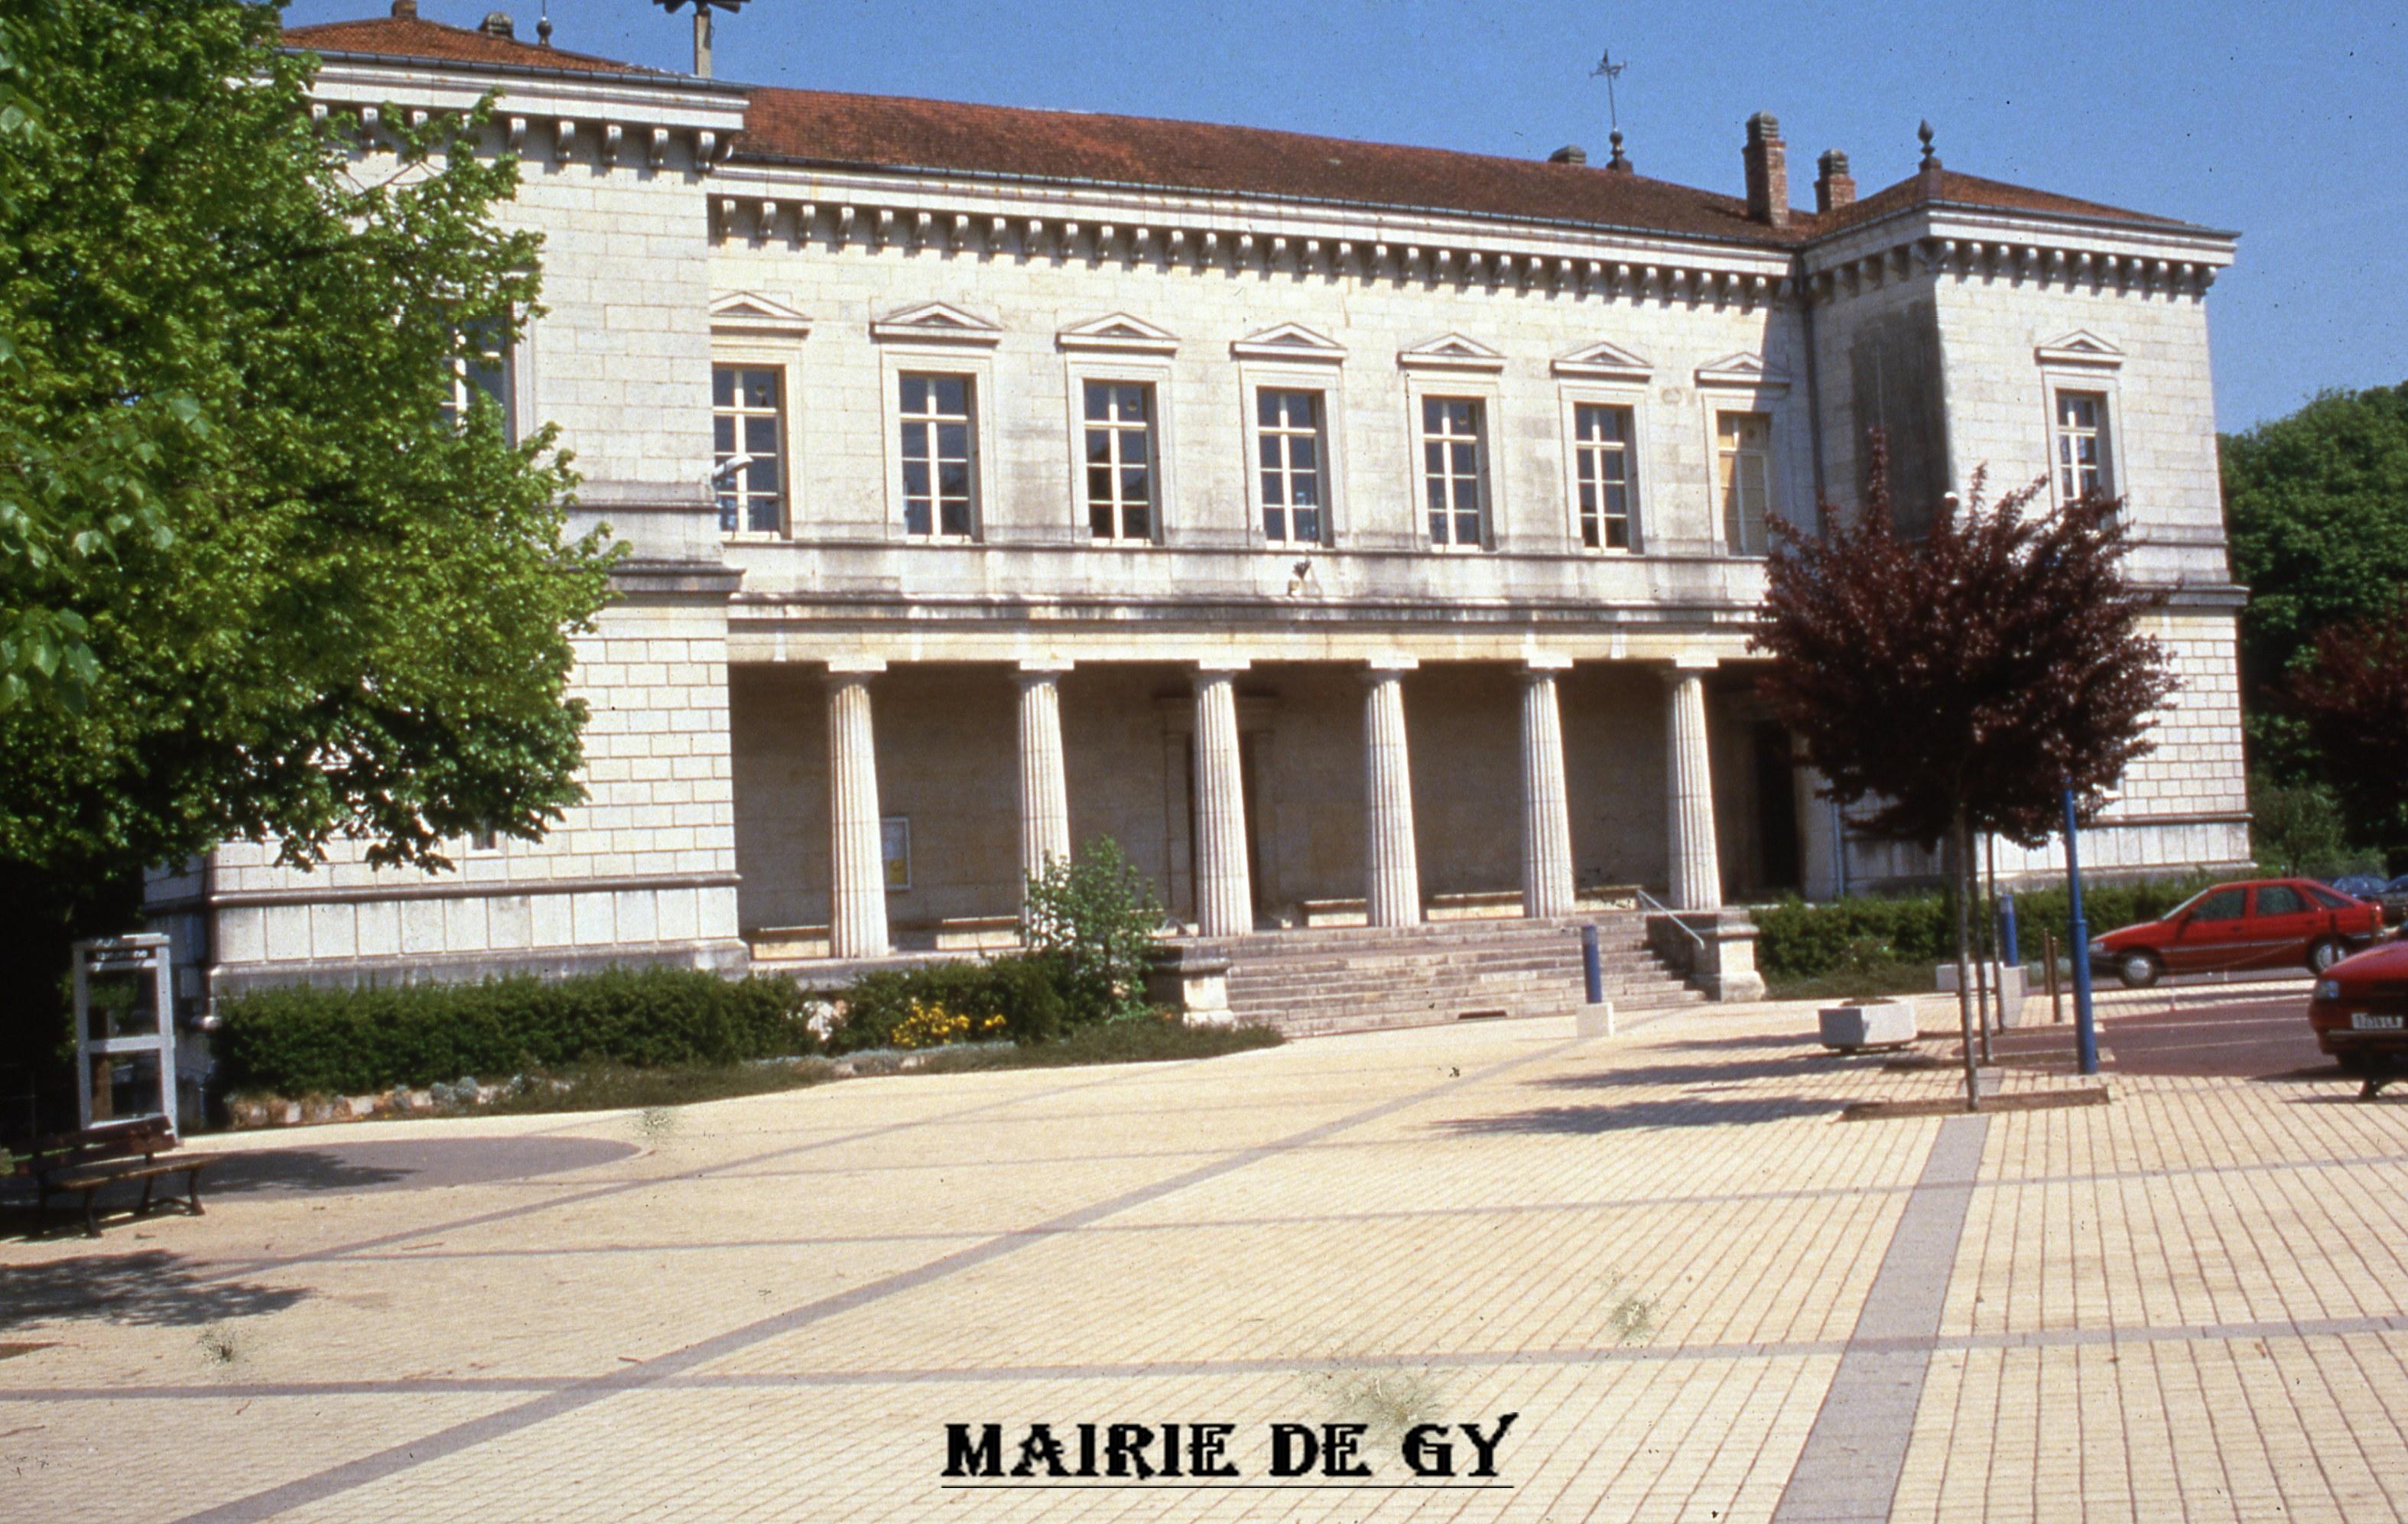 mairie-de-gy